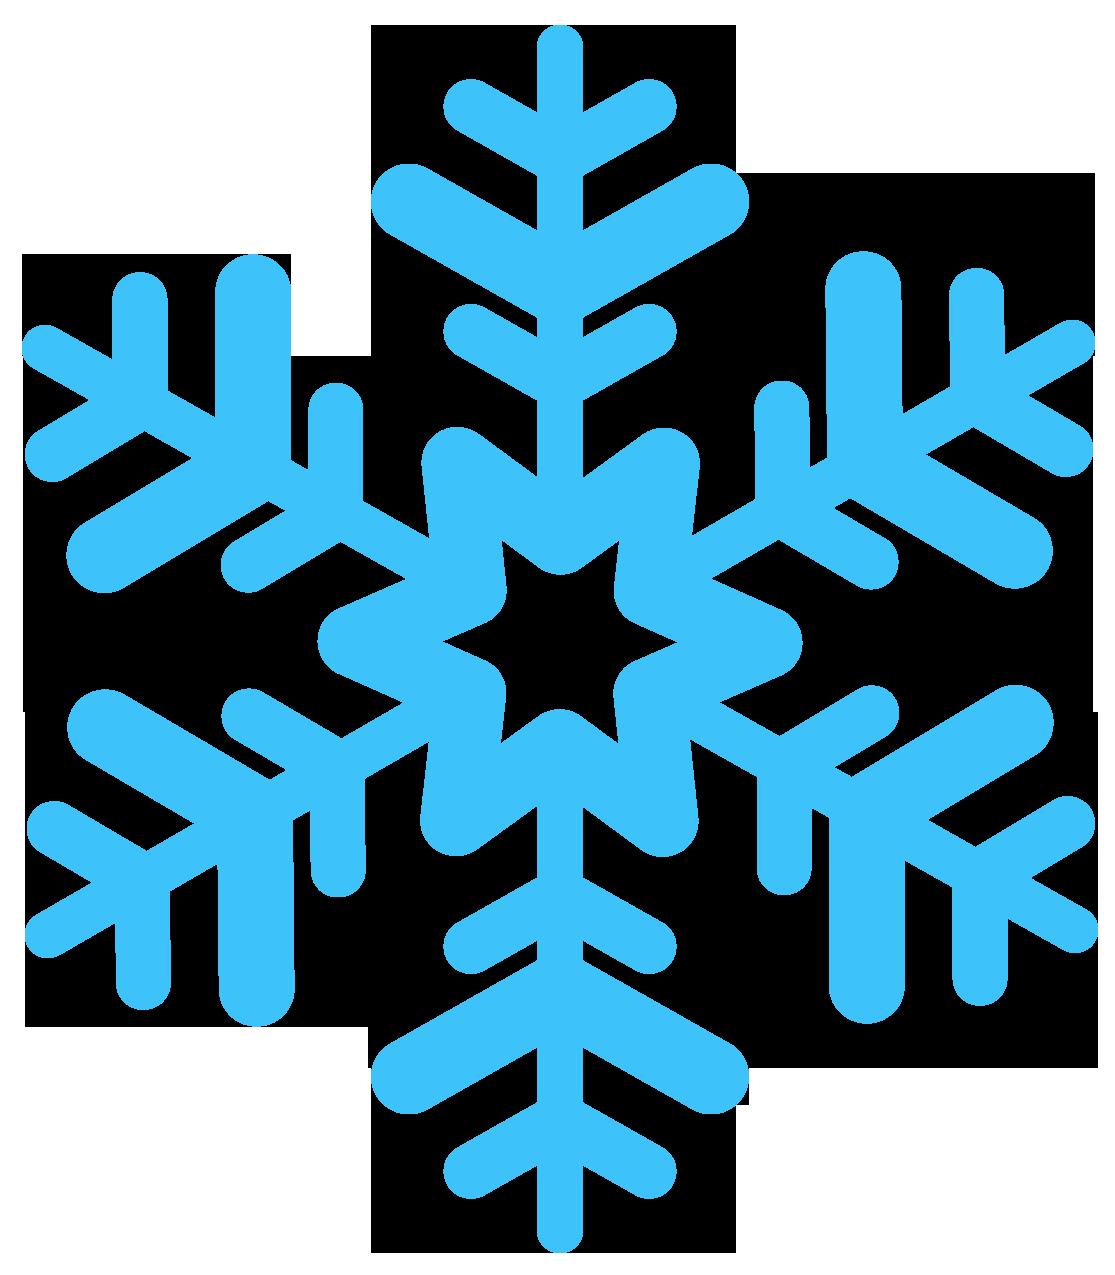 Clip art snowflakes png. Clipart snowflake light blue